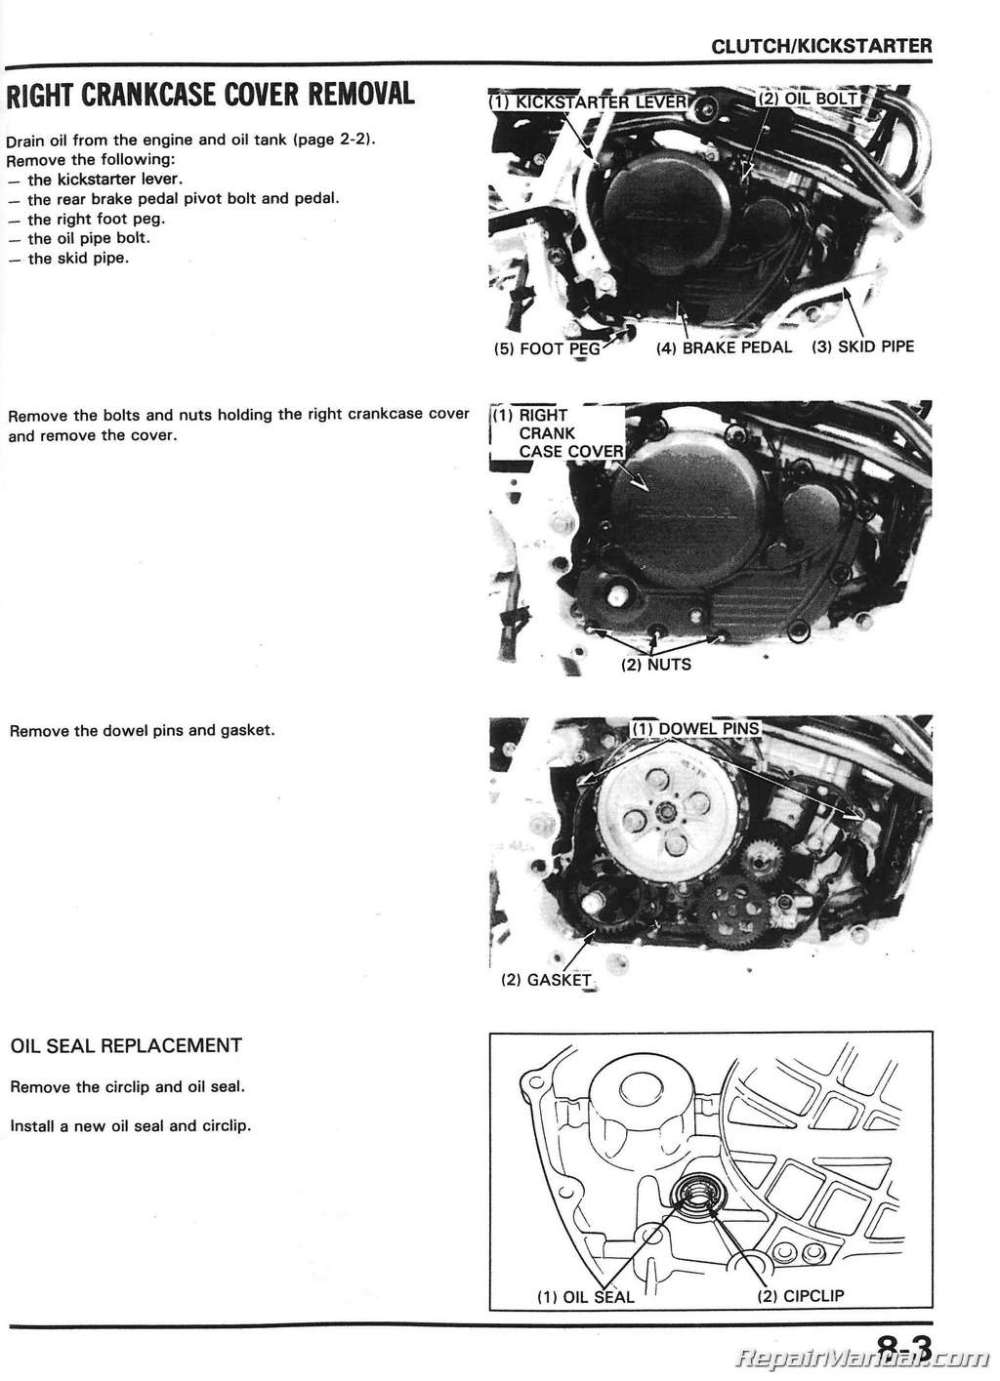 medium resolution of 1987 xr600r wiring diagram 4k wiki wallpapers 2018